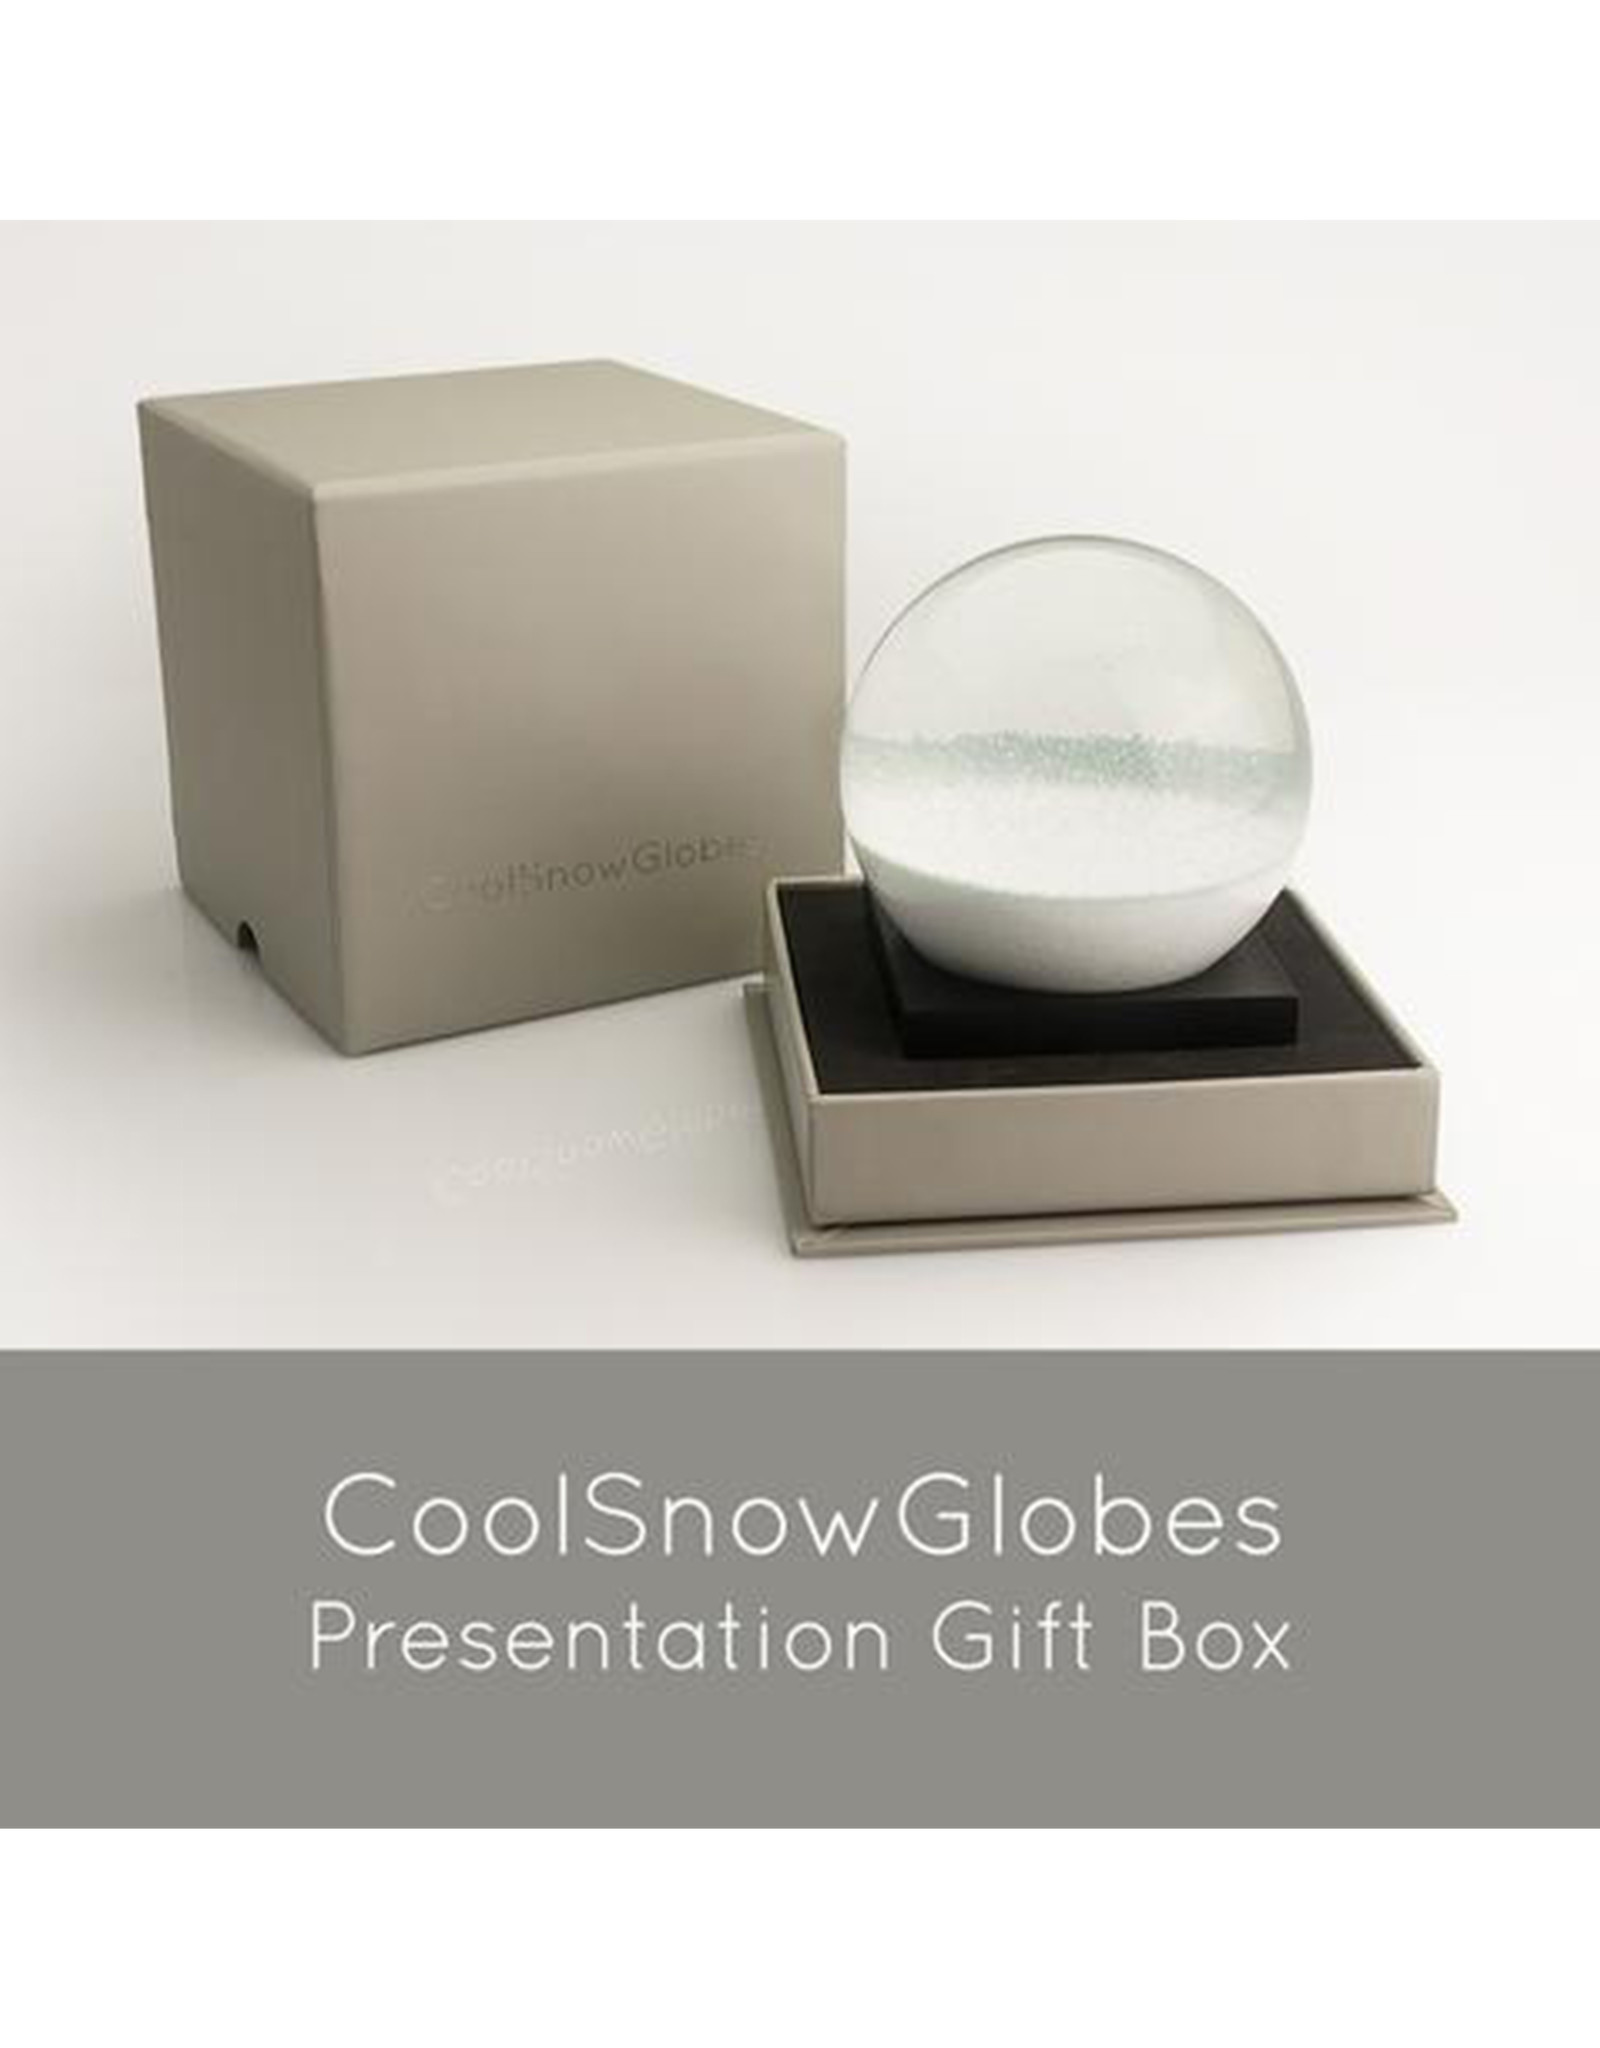 COOL SNOW GLOBES ECLIPSE SNOW GLOBE